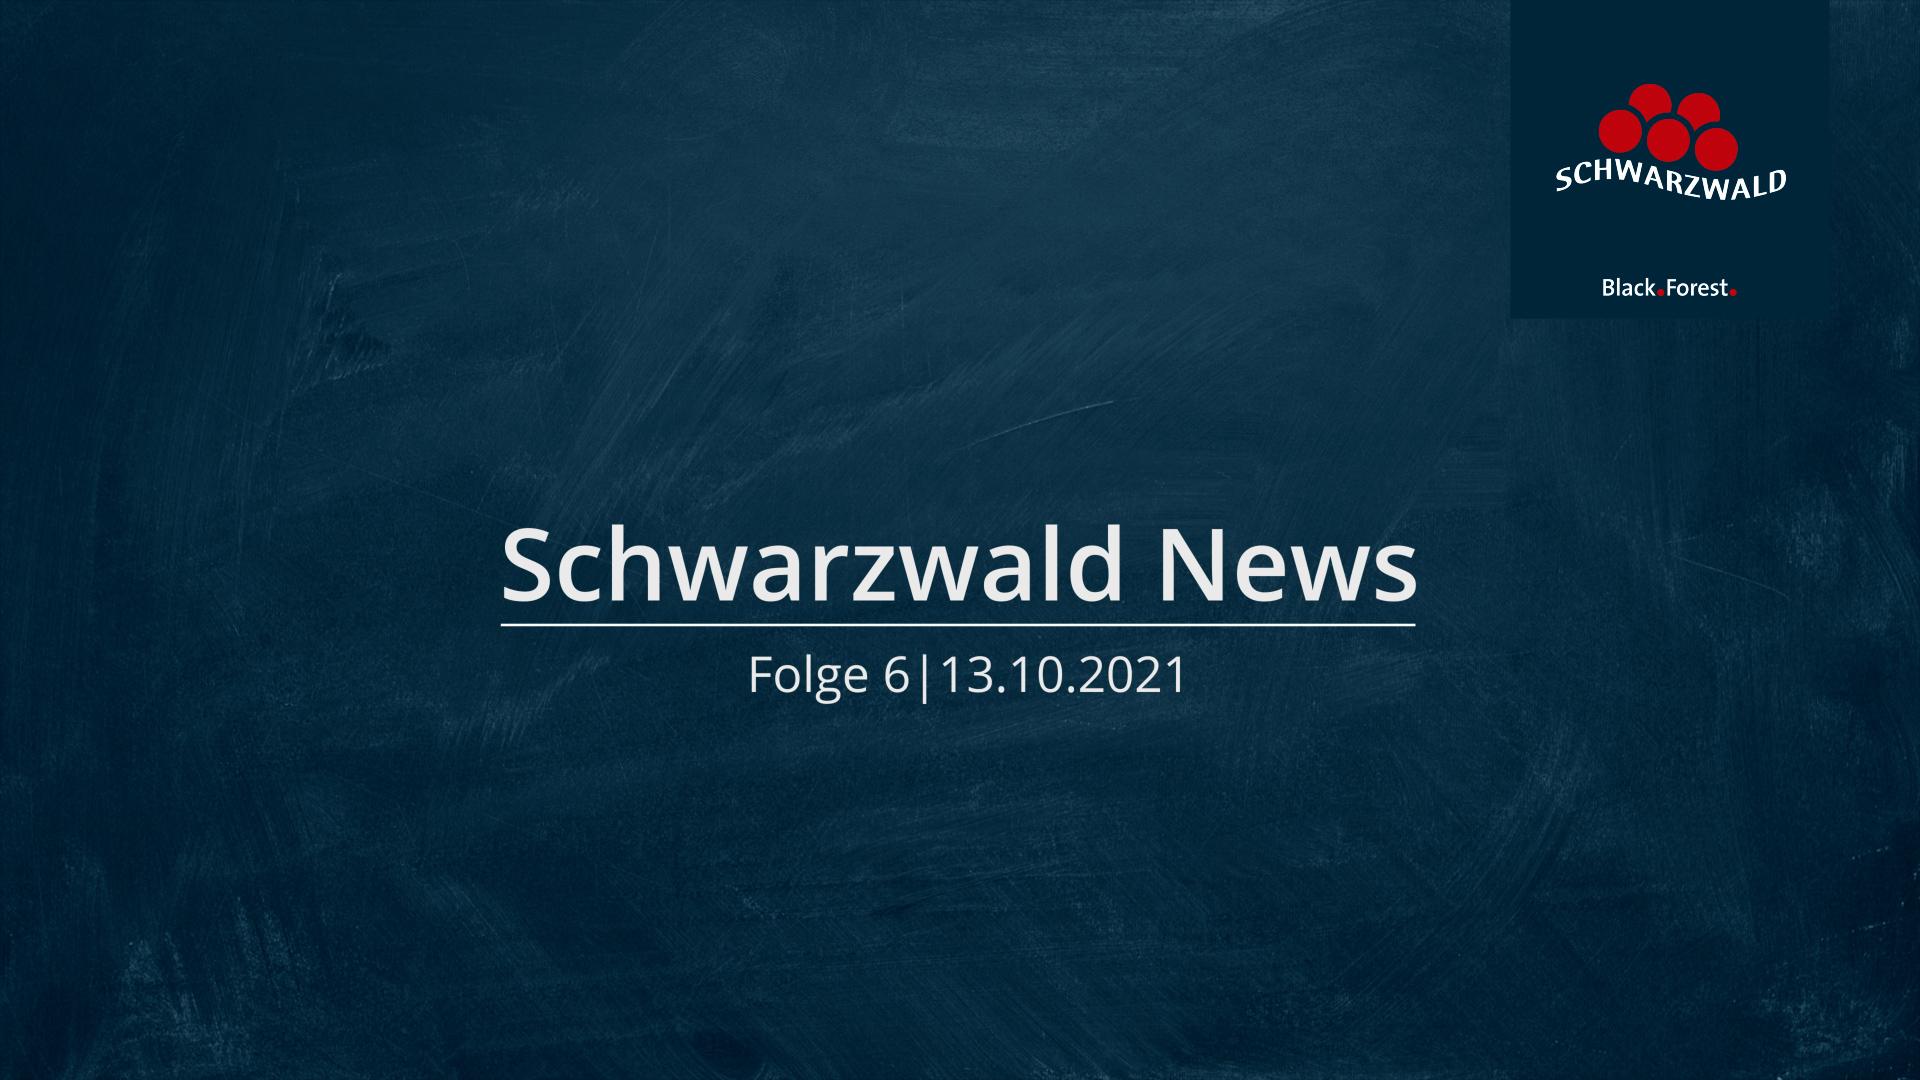 Schwarzwald News Folge 6